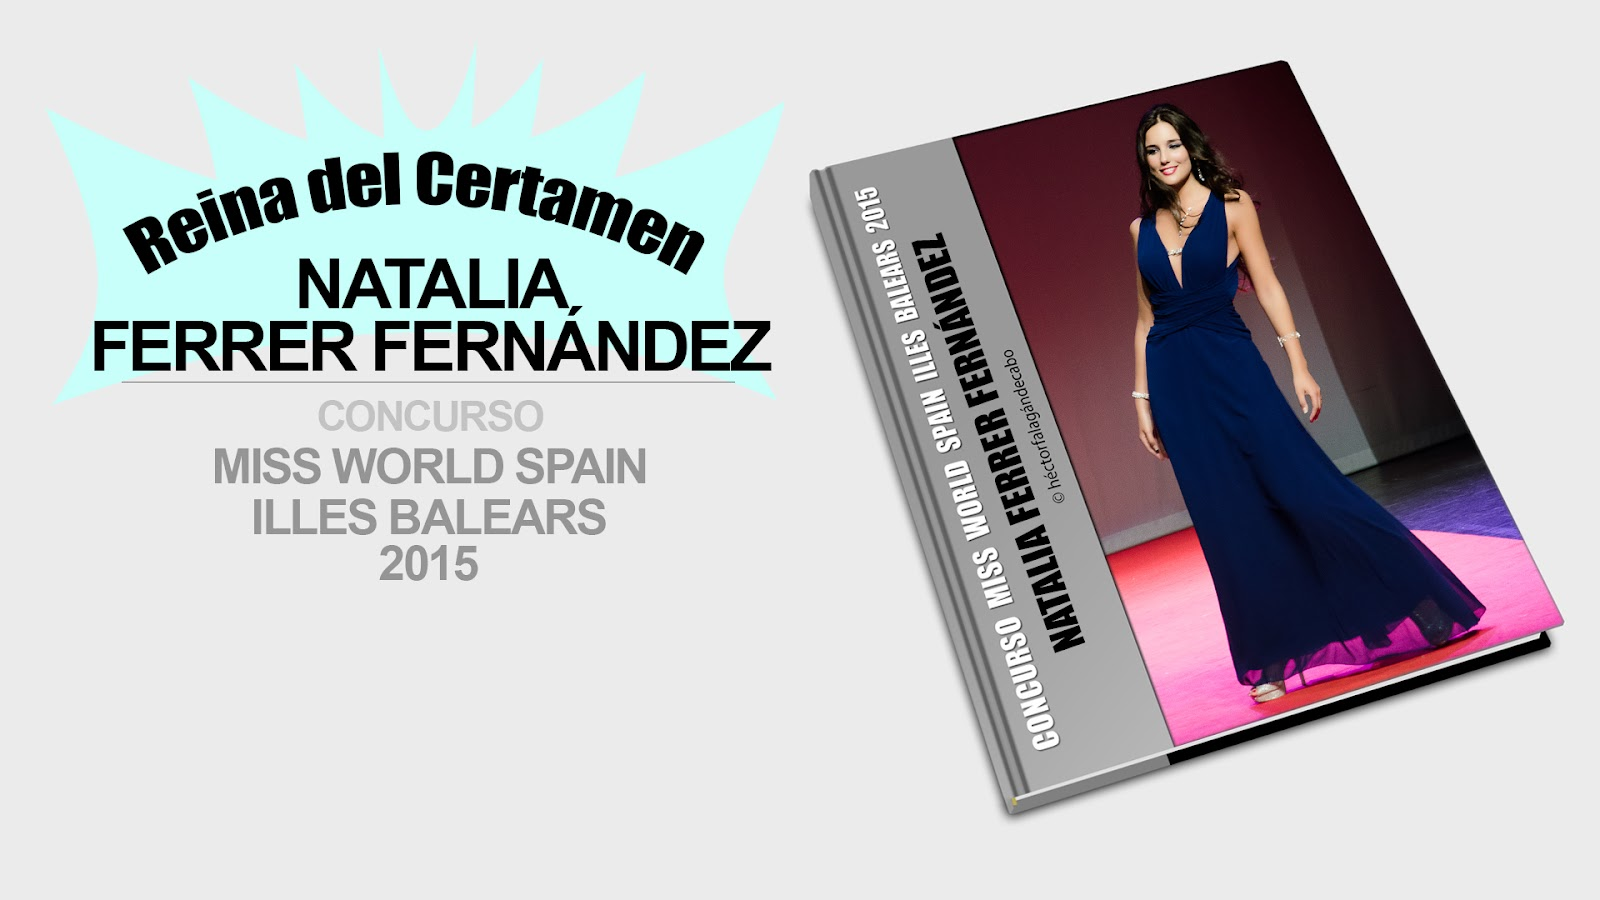 Fotografía Modelos Mallorca. Natalia Ferrer Fernández: MISS WORLD ILLES BALEARS 2015. Héctor Falagán De Cabo | hfilms & photography. Mallorca, Islas Baleares, España.